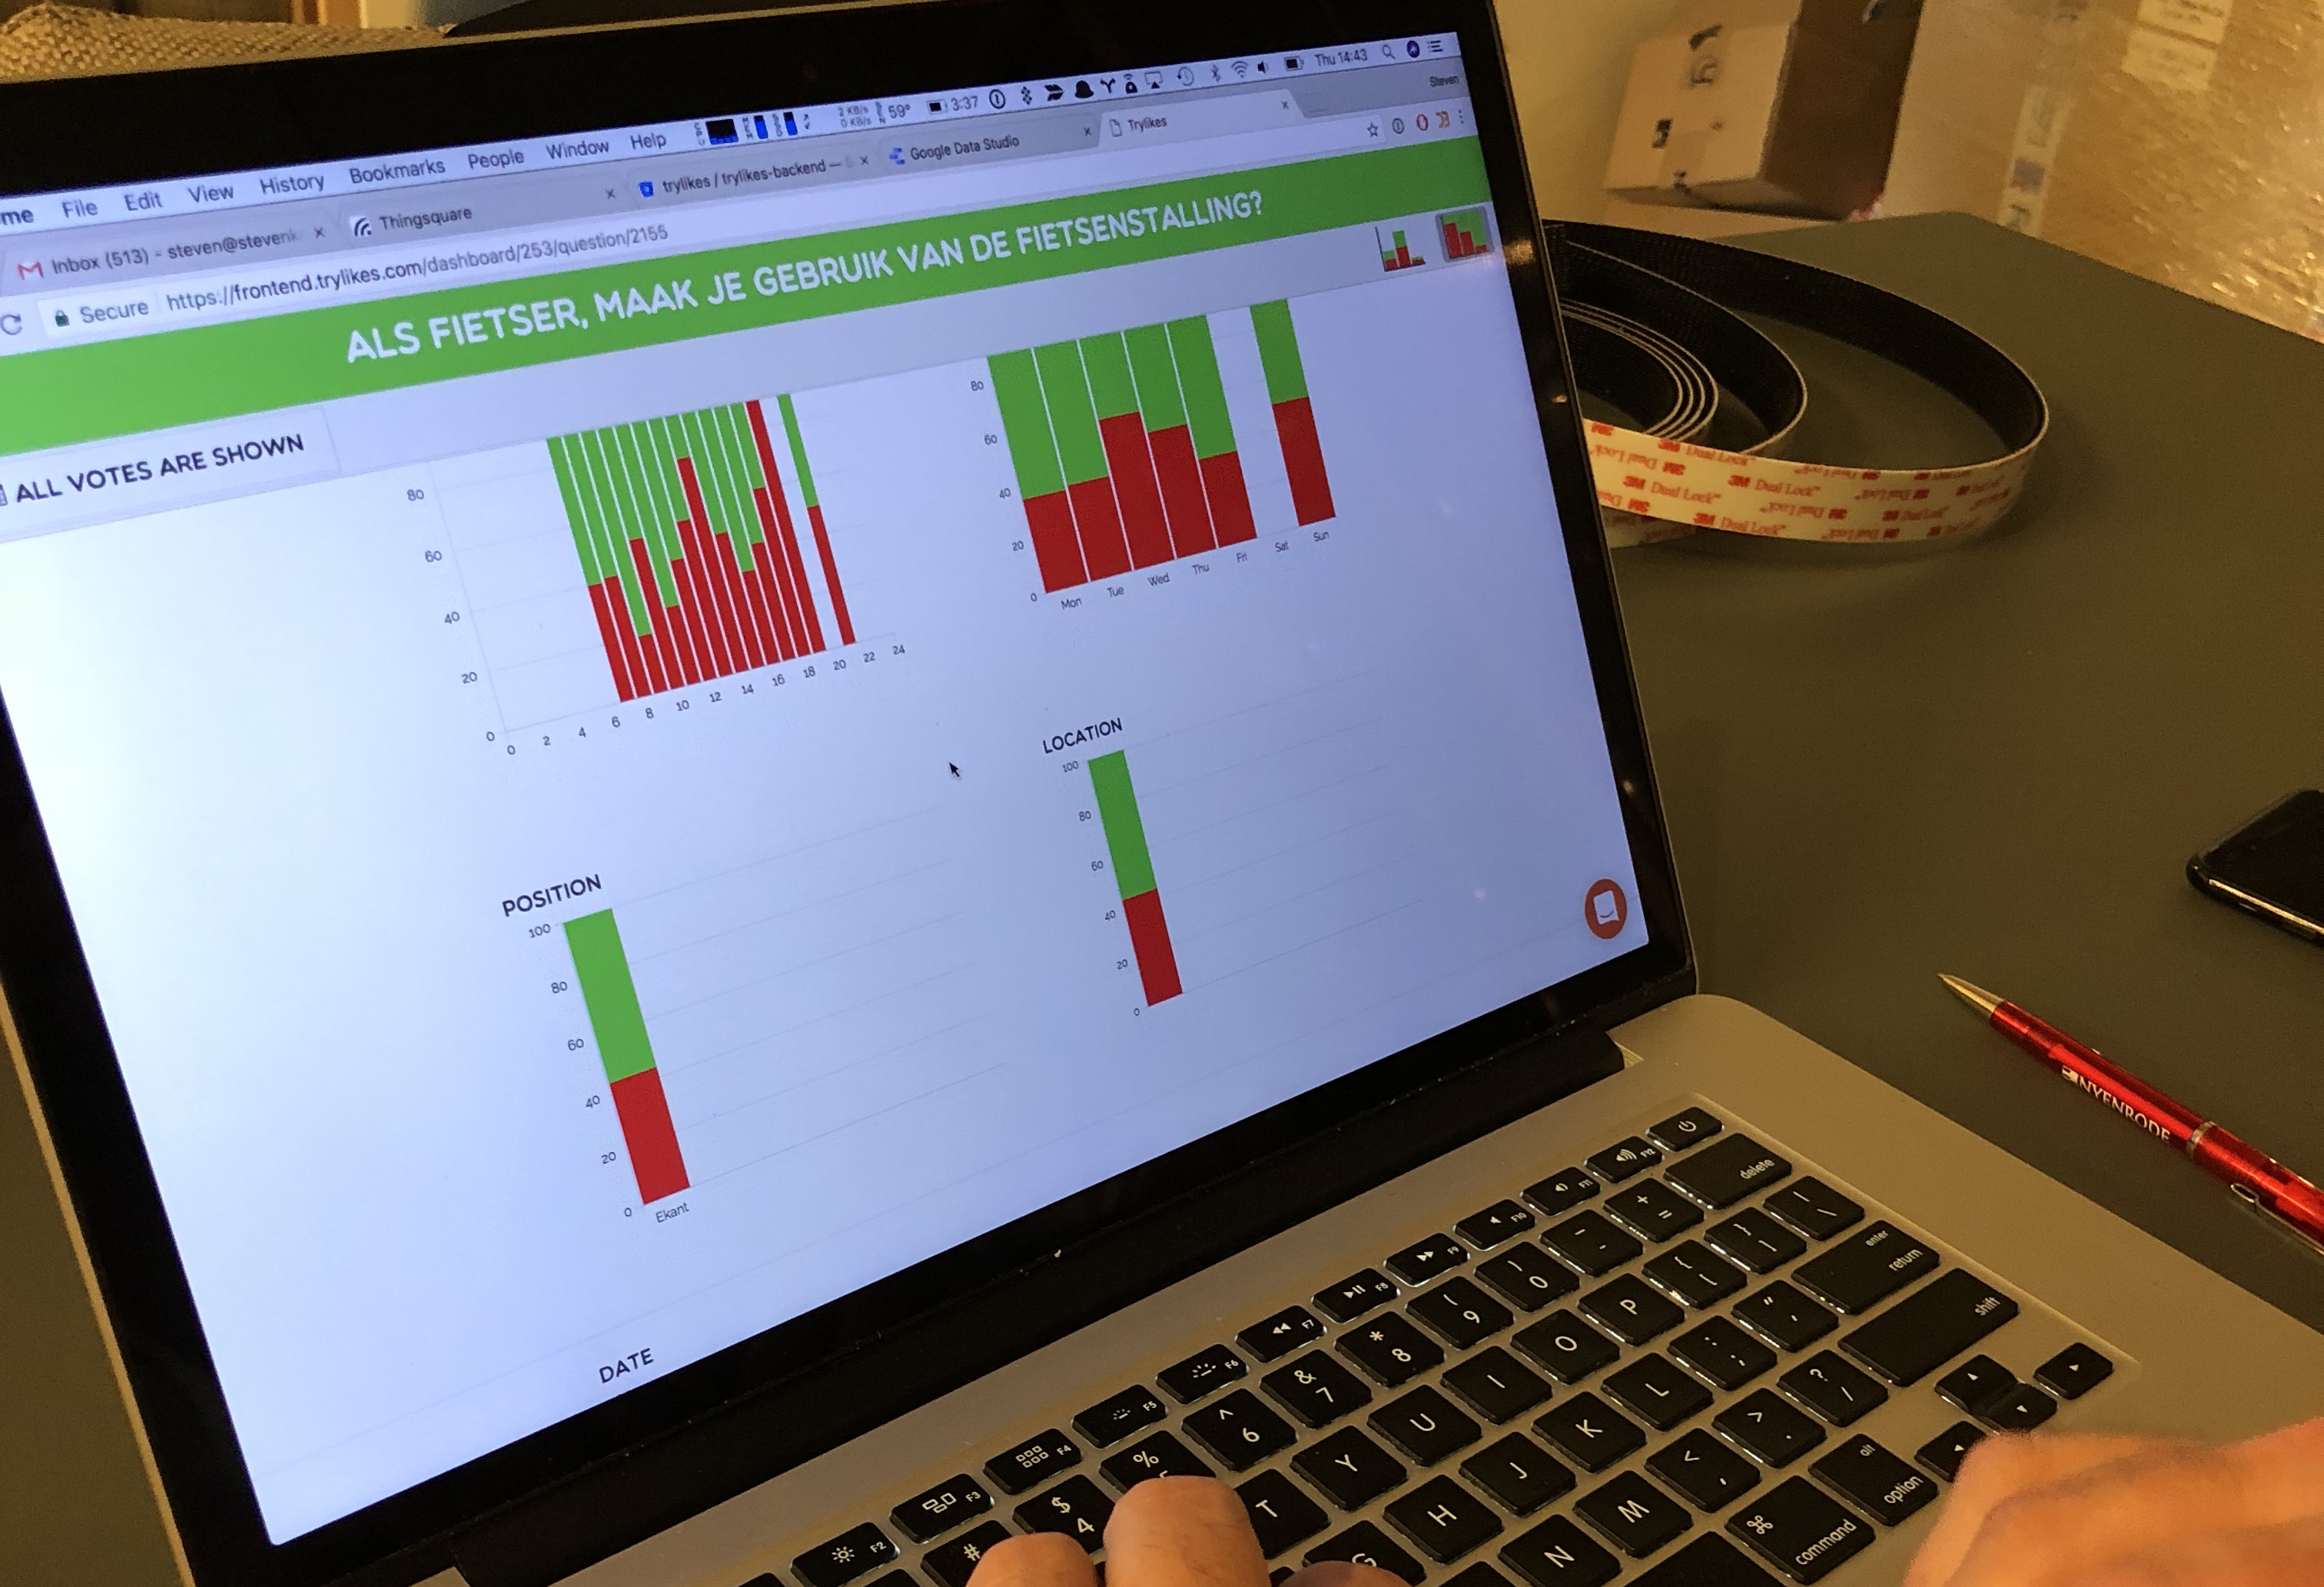 Solution d'analyse IoT pour les boutons de satisfaction client TryLikes